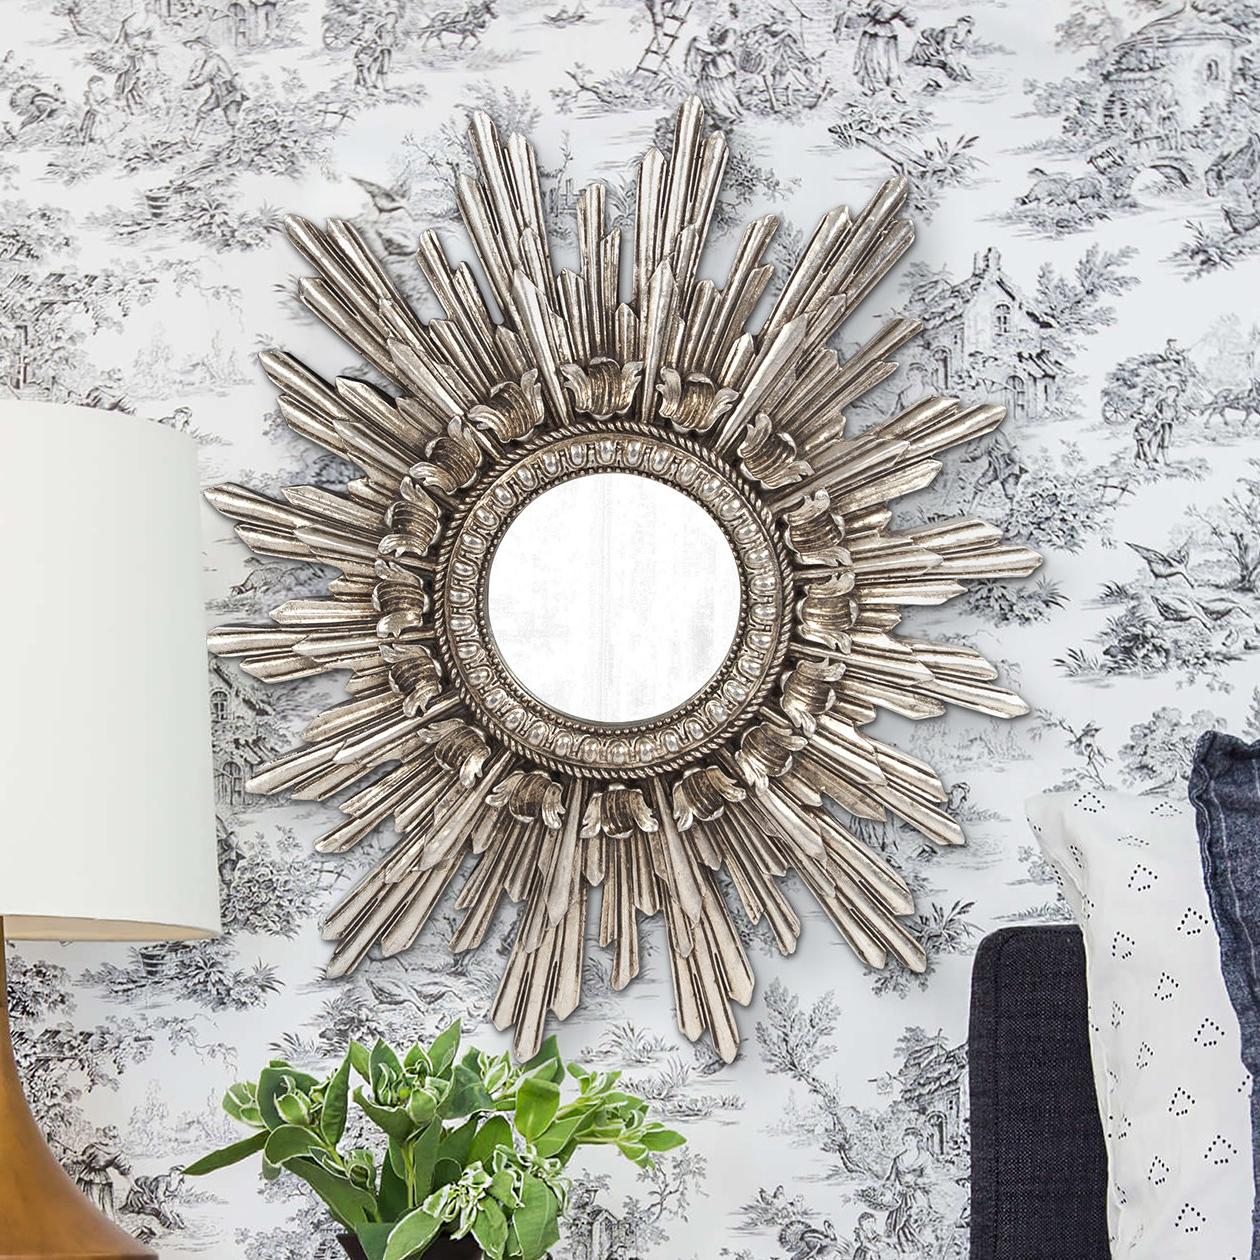 Heffington Starburst Accent Mirror Within Popular Josephson Starburst Glam Beveled Accent Wall Mirrors (Gallery 12 of 20)